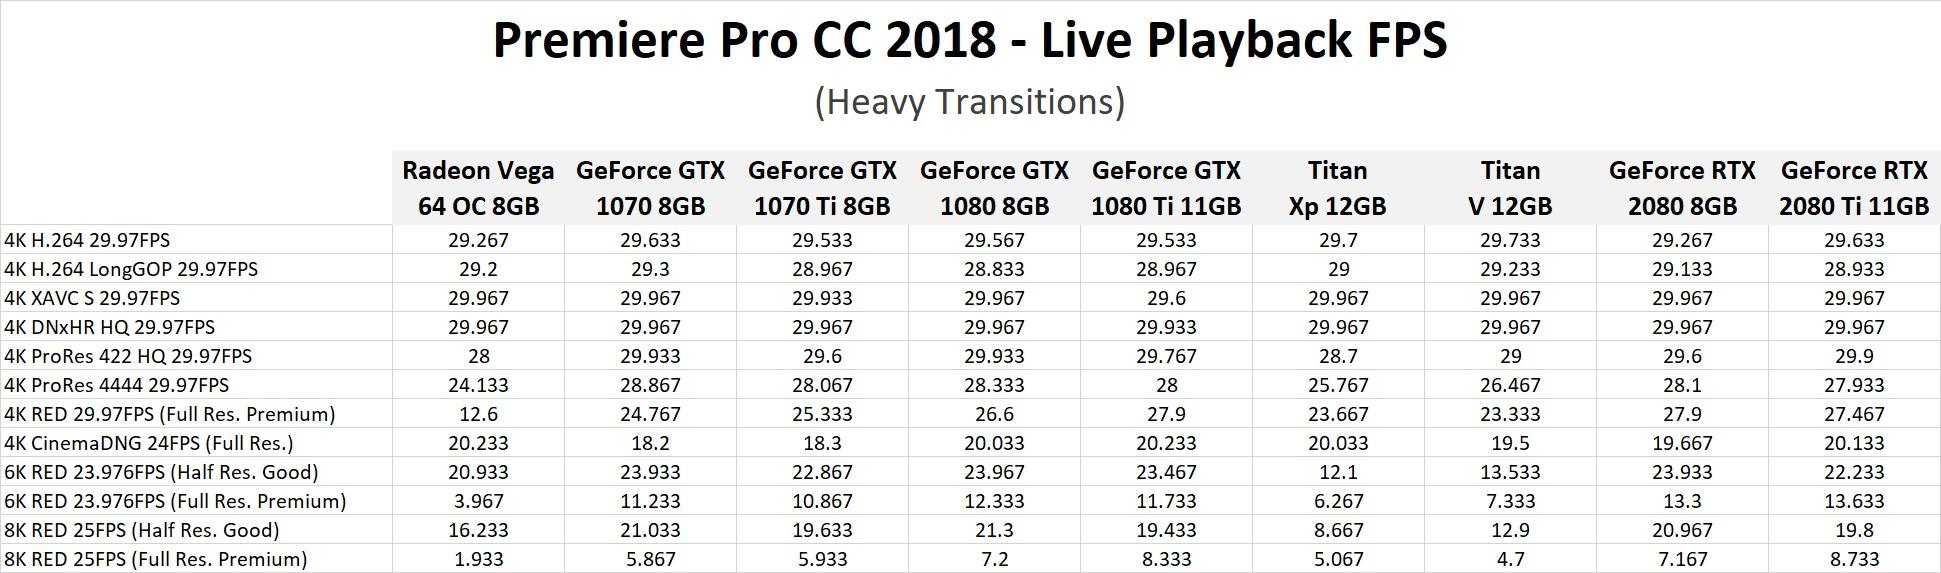 Premiere Pro CC 2018: NVIDIA GeForce RTX 2080 & 2080 Ti Performance